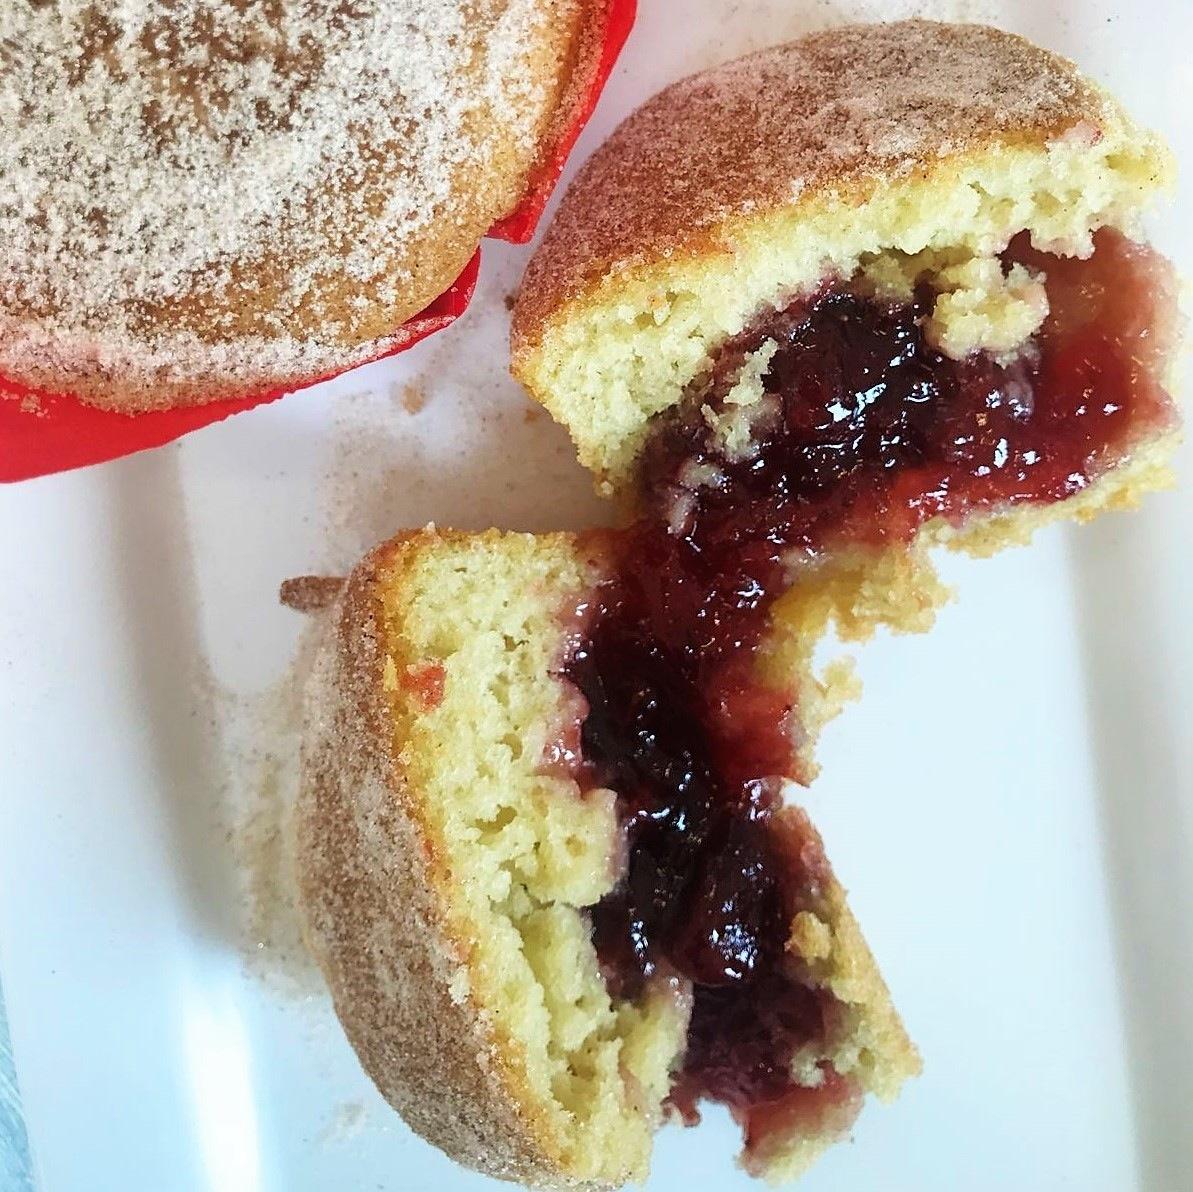 https://i1.wp.com/fatgayvegan.com/wp-content/uploads/2019/06/Jam-Doughnut-Muffin-1-2.jpg?fit=1193%2C1192&ssl=1